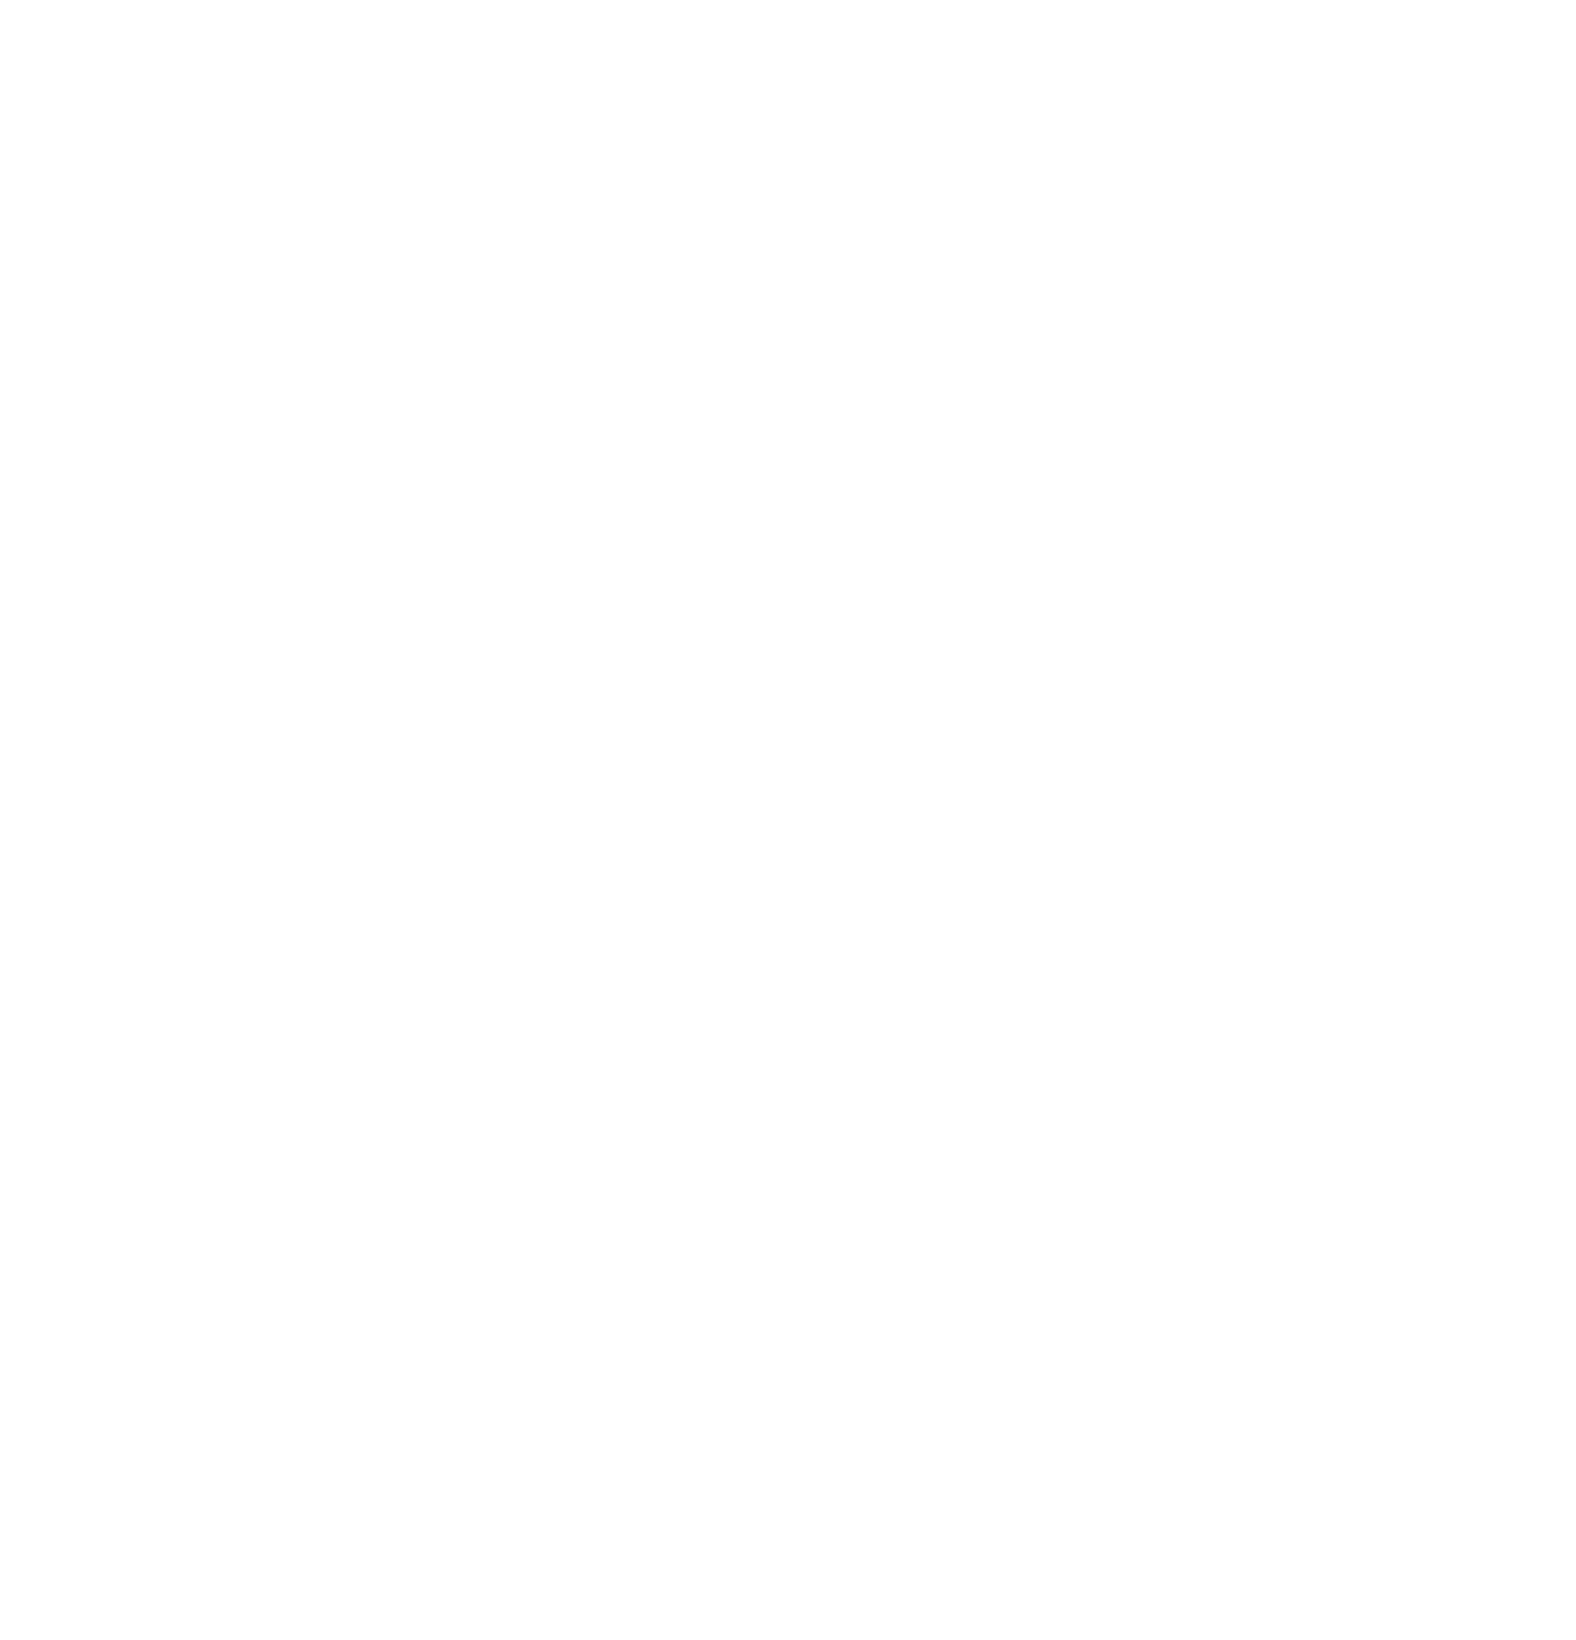 brain top view_white_thicker stroke